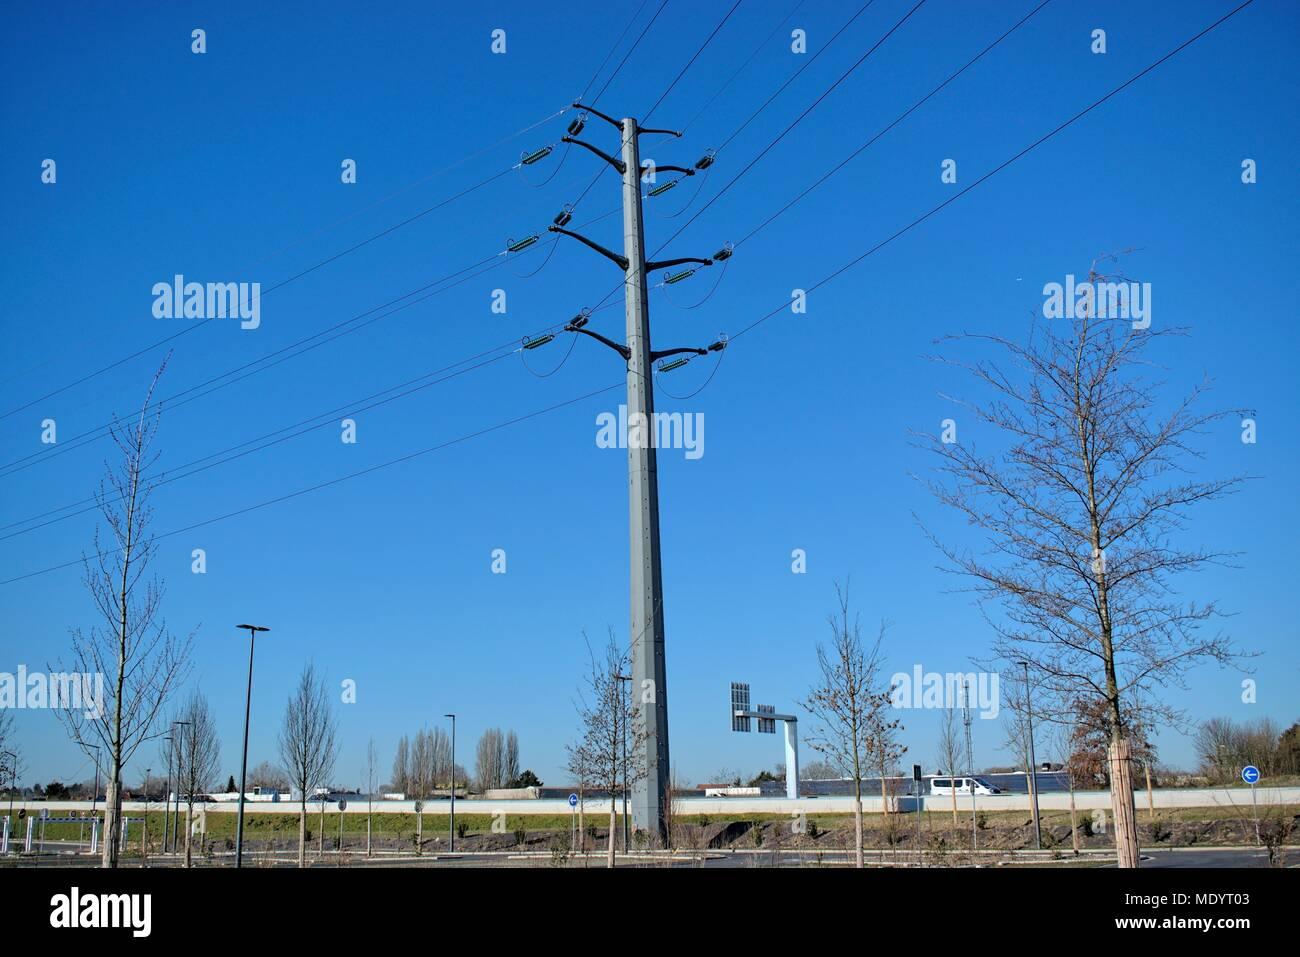 Power Transmission Line Pole Stock Photos & Power